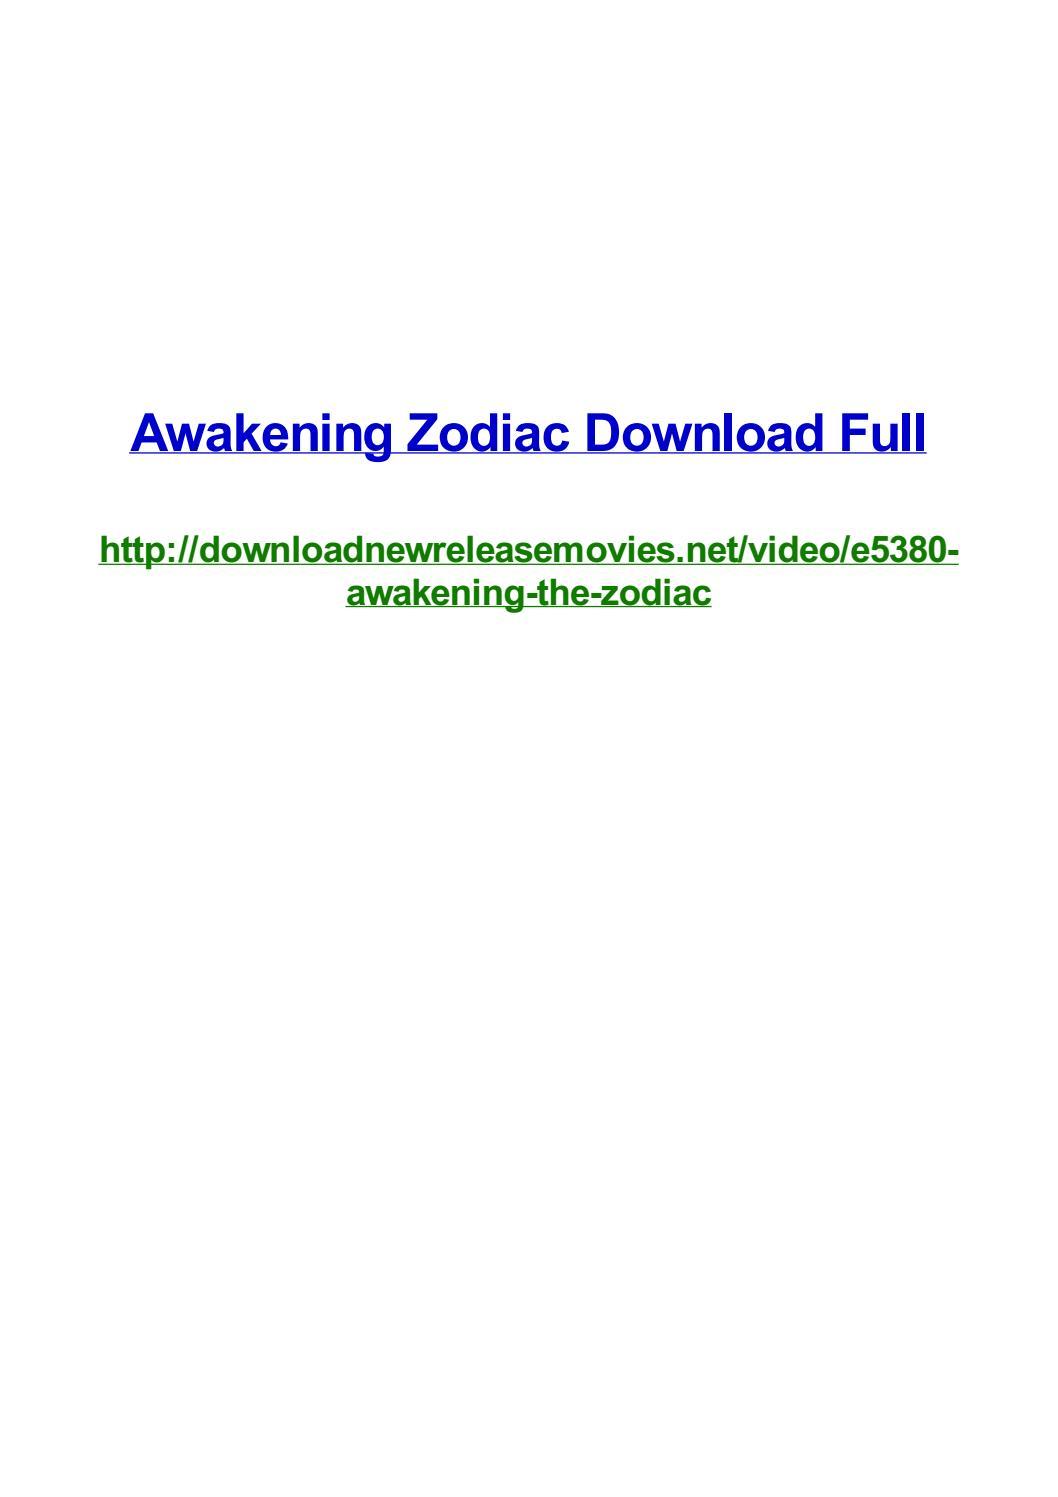 Argentina Warez Videos Porno awakening zodiac download fullfrank seamons - issuu